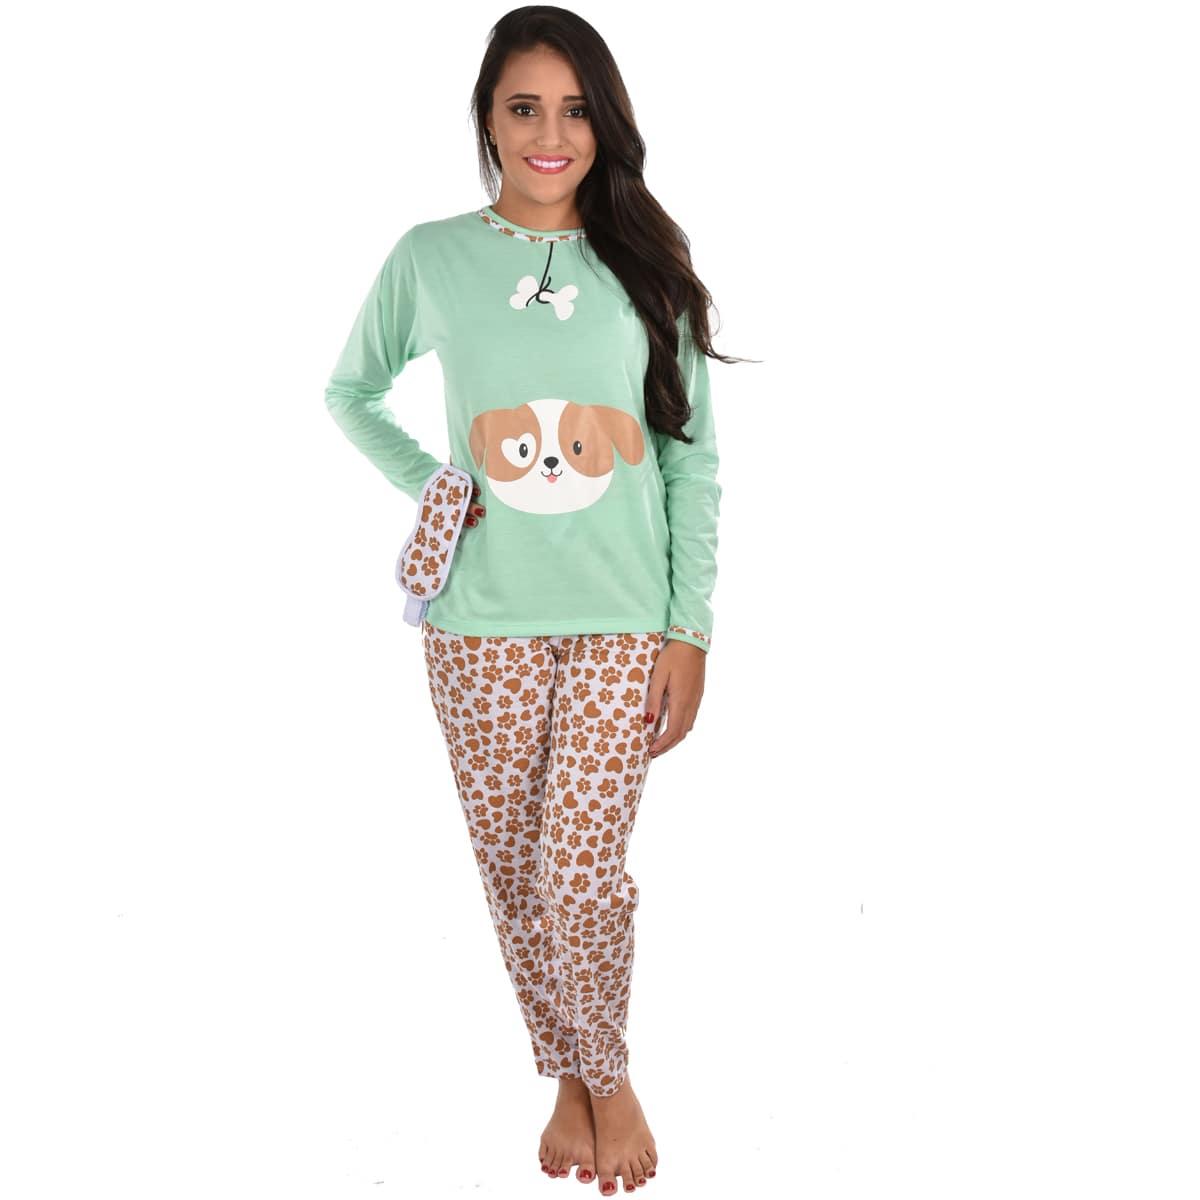 Pijama Longo Calça Máscara de Dormir Feminino Adulto Cachorro 310